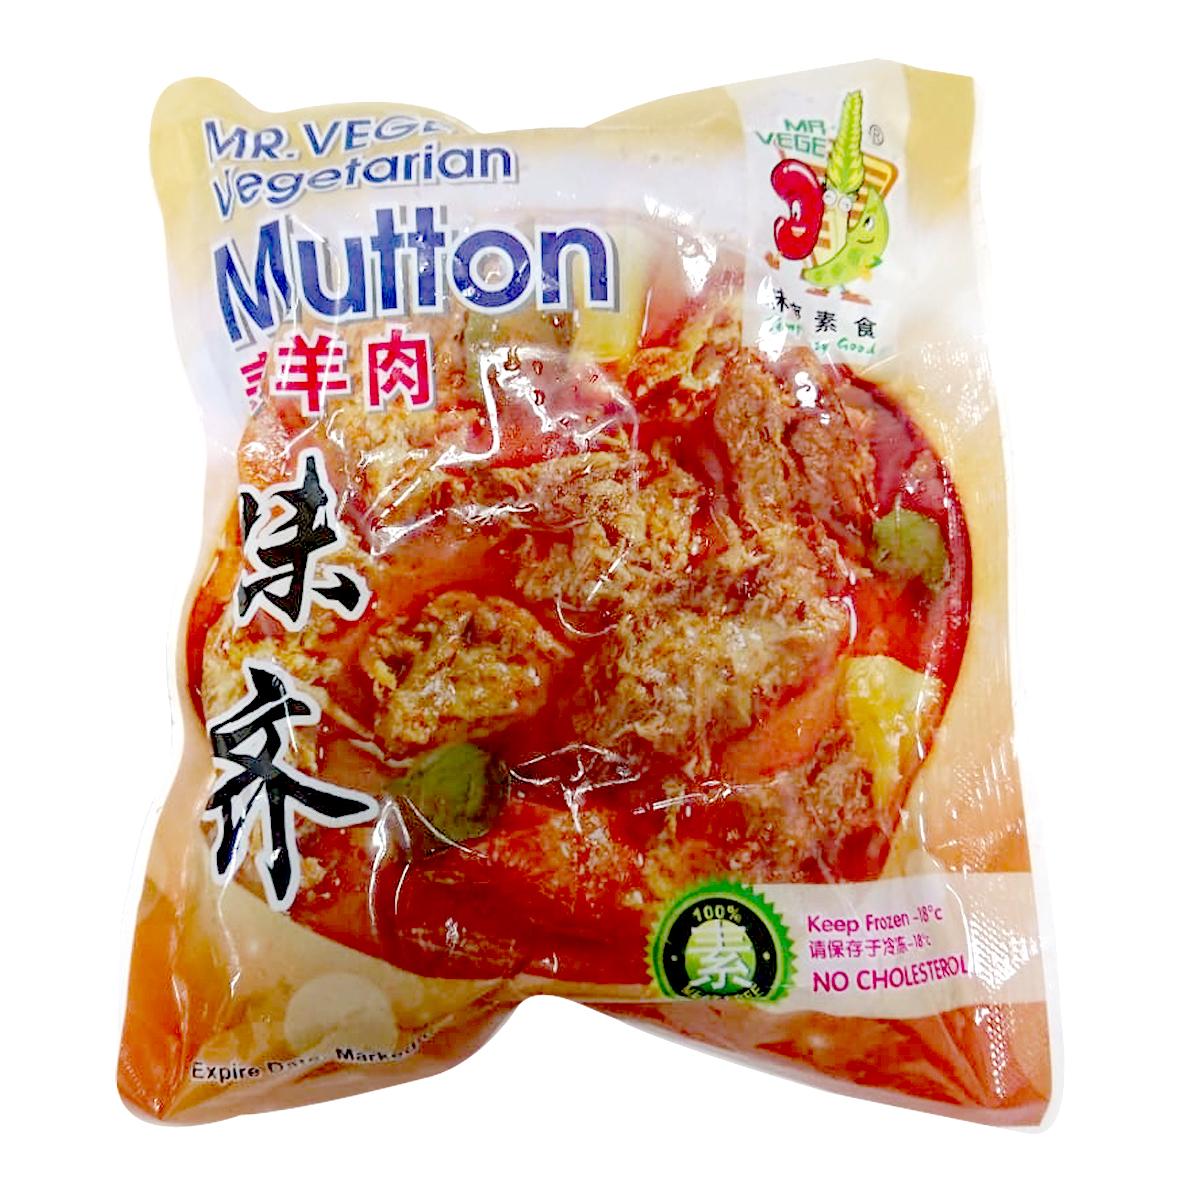 Image Mr. Vege Mutton 味齐 - 素羊肉 250grams